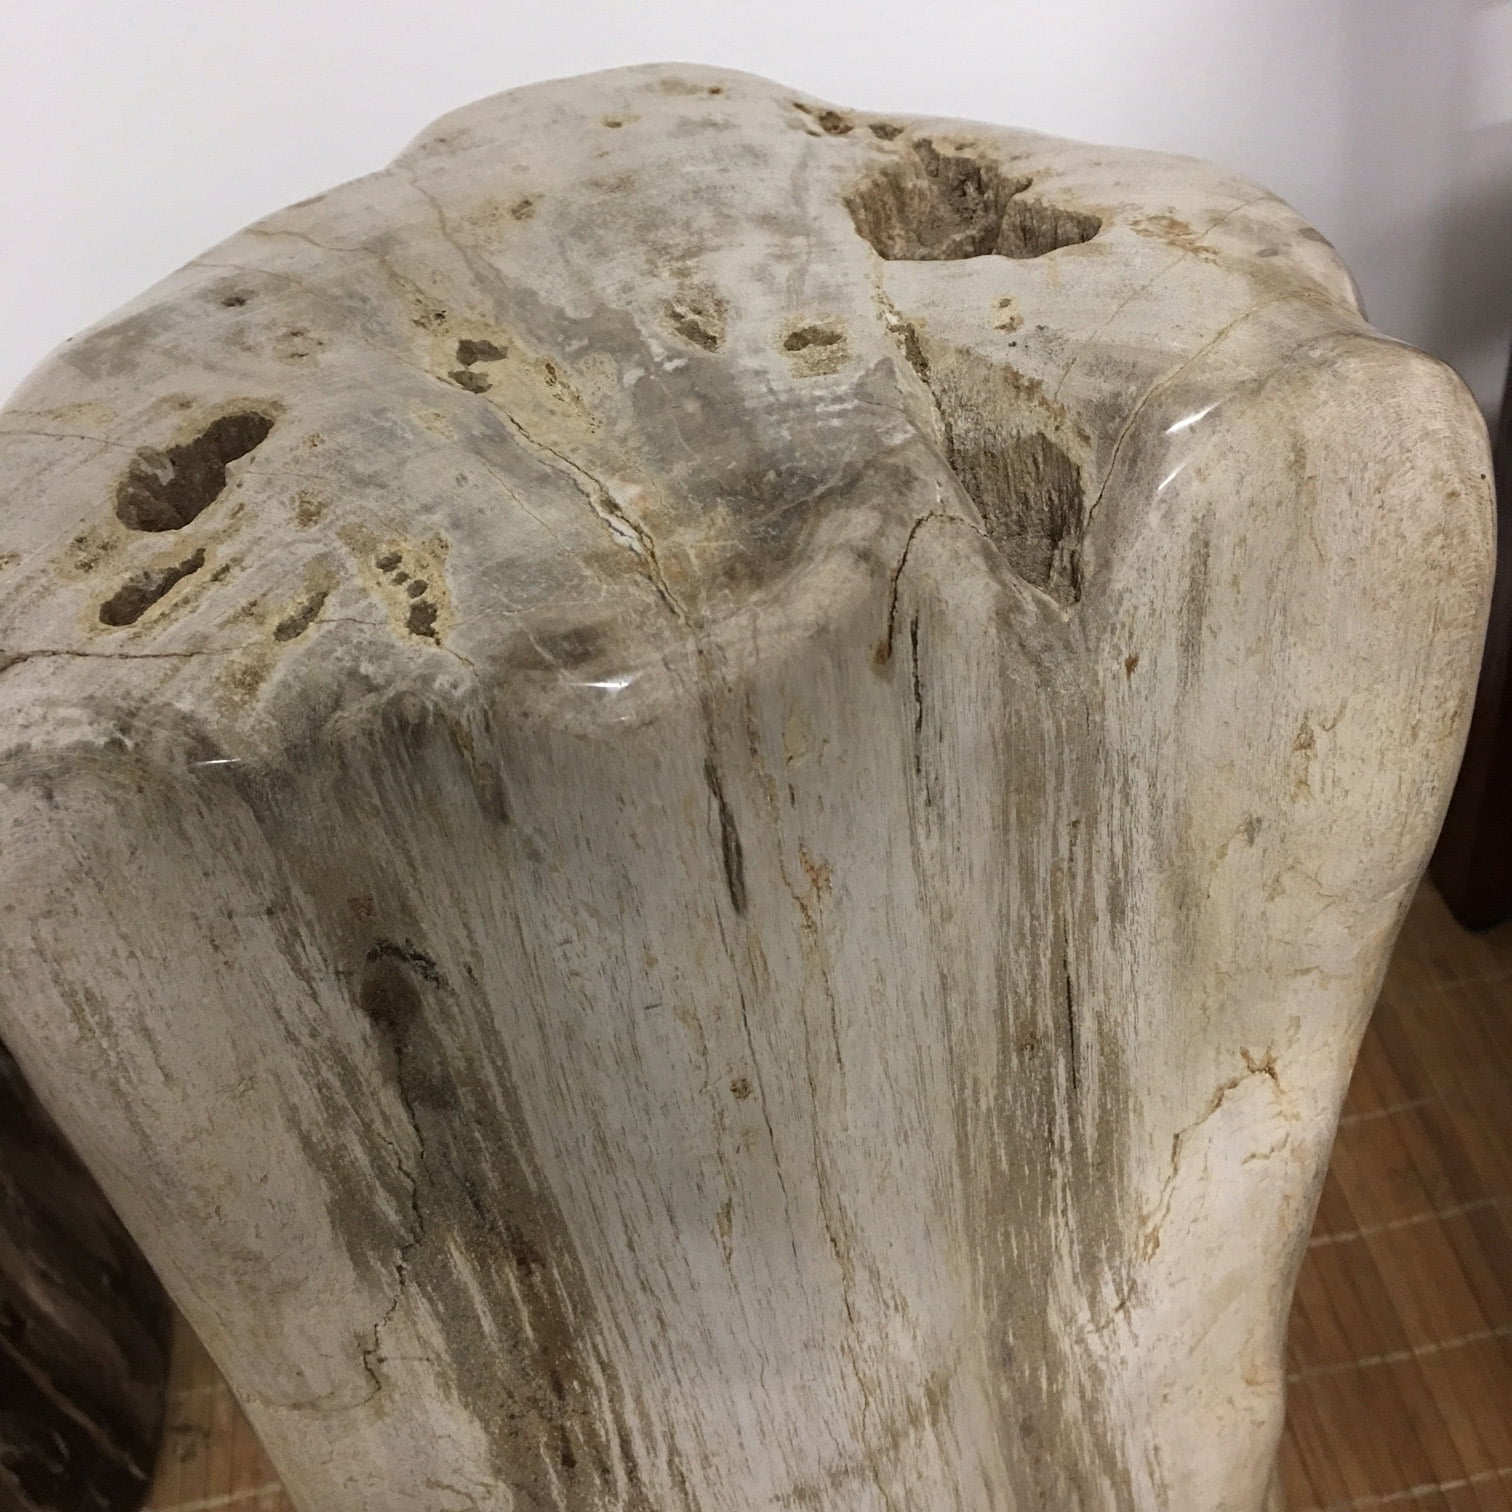 100 Petrified Wood Side Table Amazing Wood Coffee  : IPW1 10 from 45.77.108.62 size 1512 x 1512 jpeg 659kB